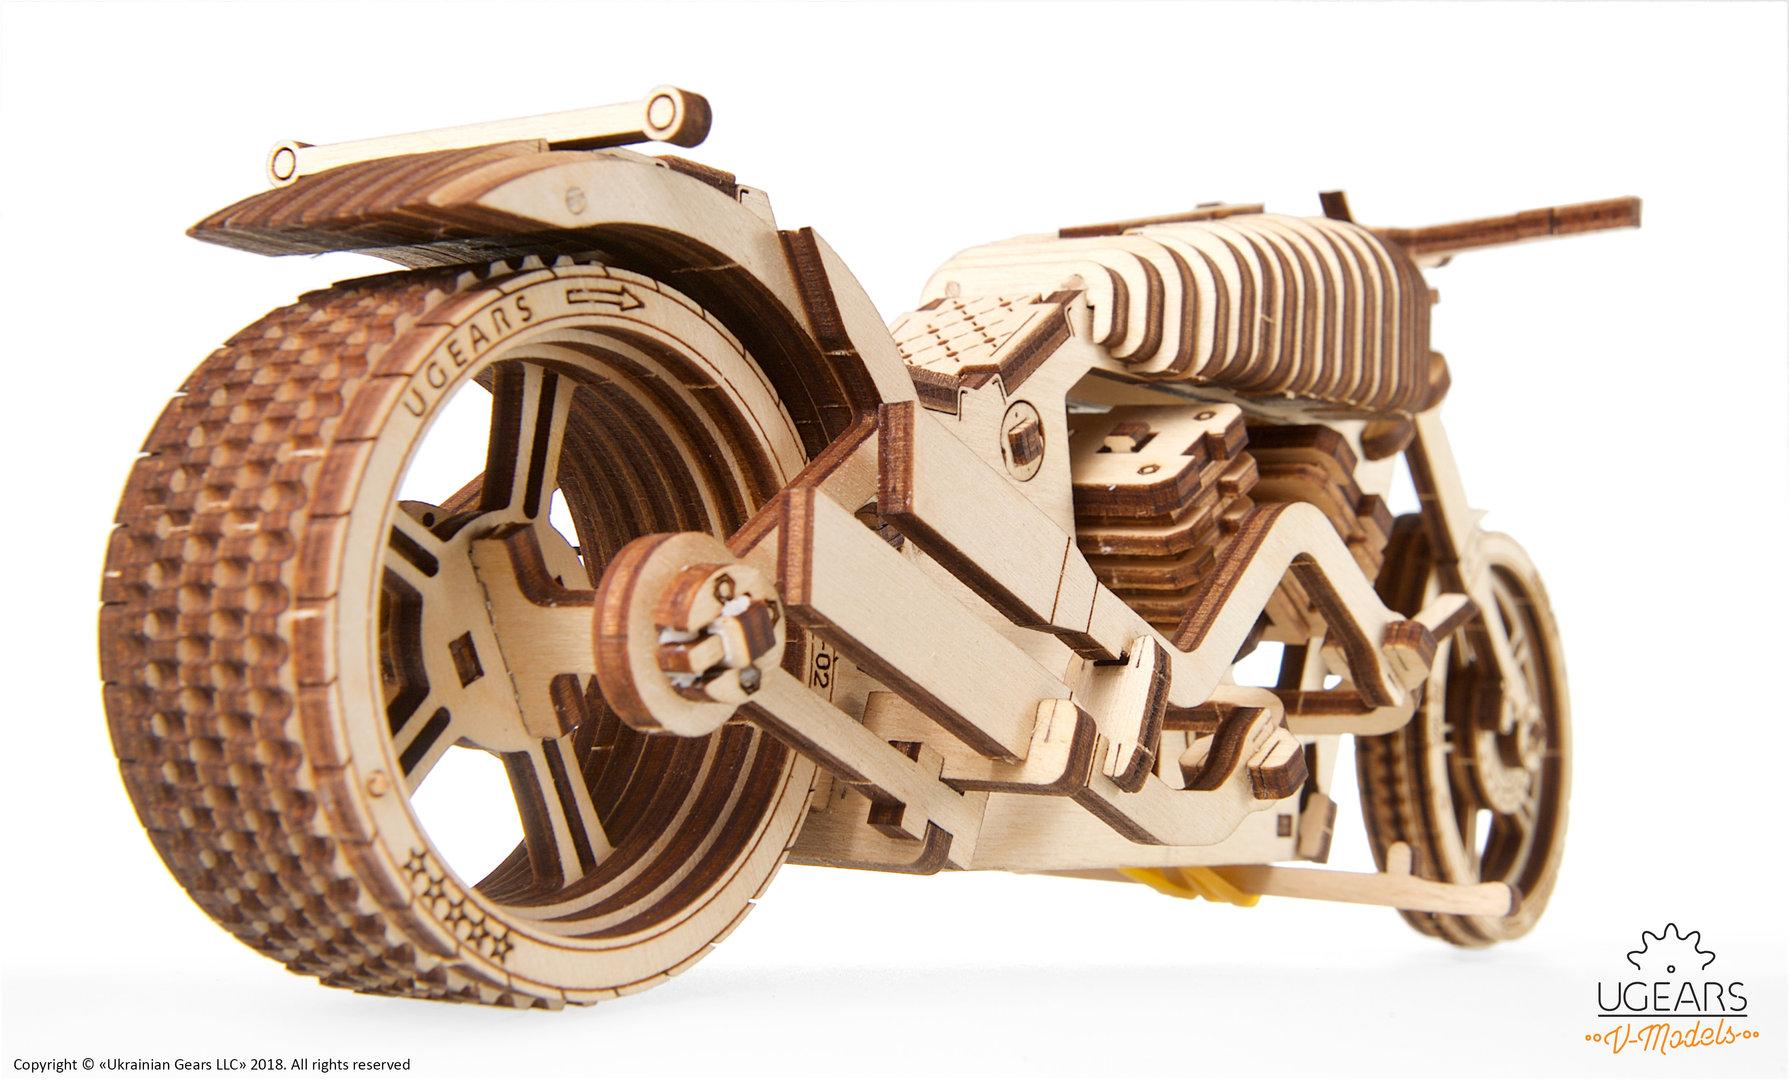 UGEARS Bike VM-02 - UGEARS - Unique Wooden Mechanical Models